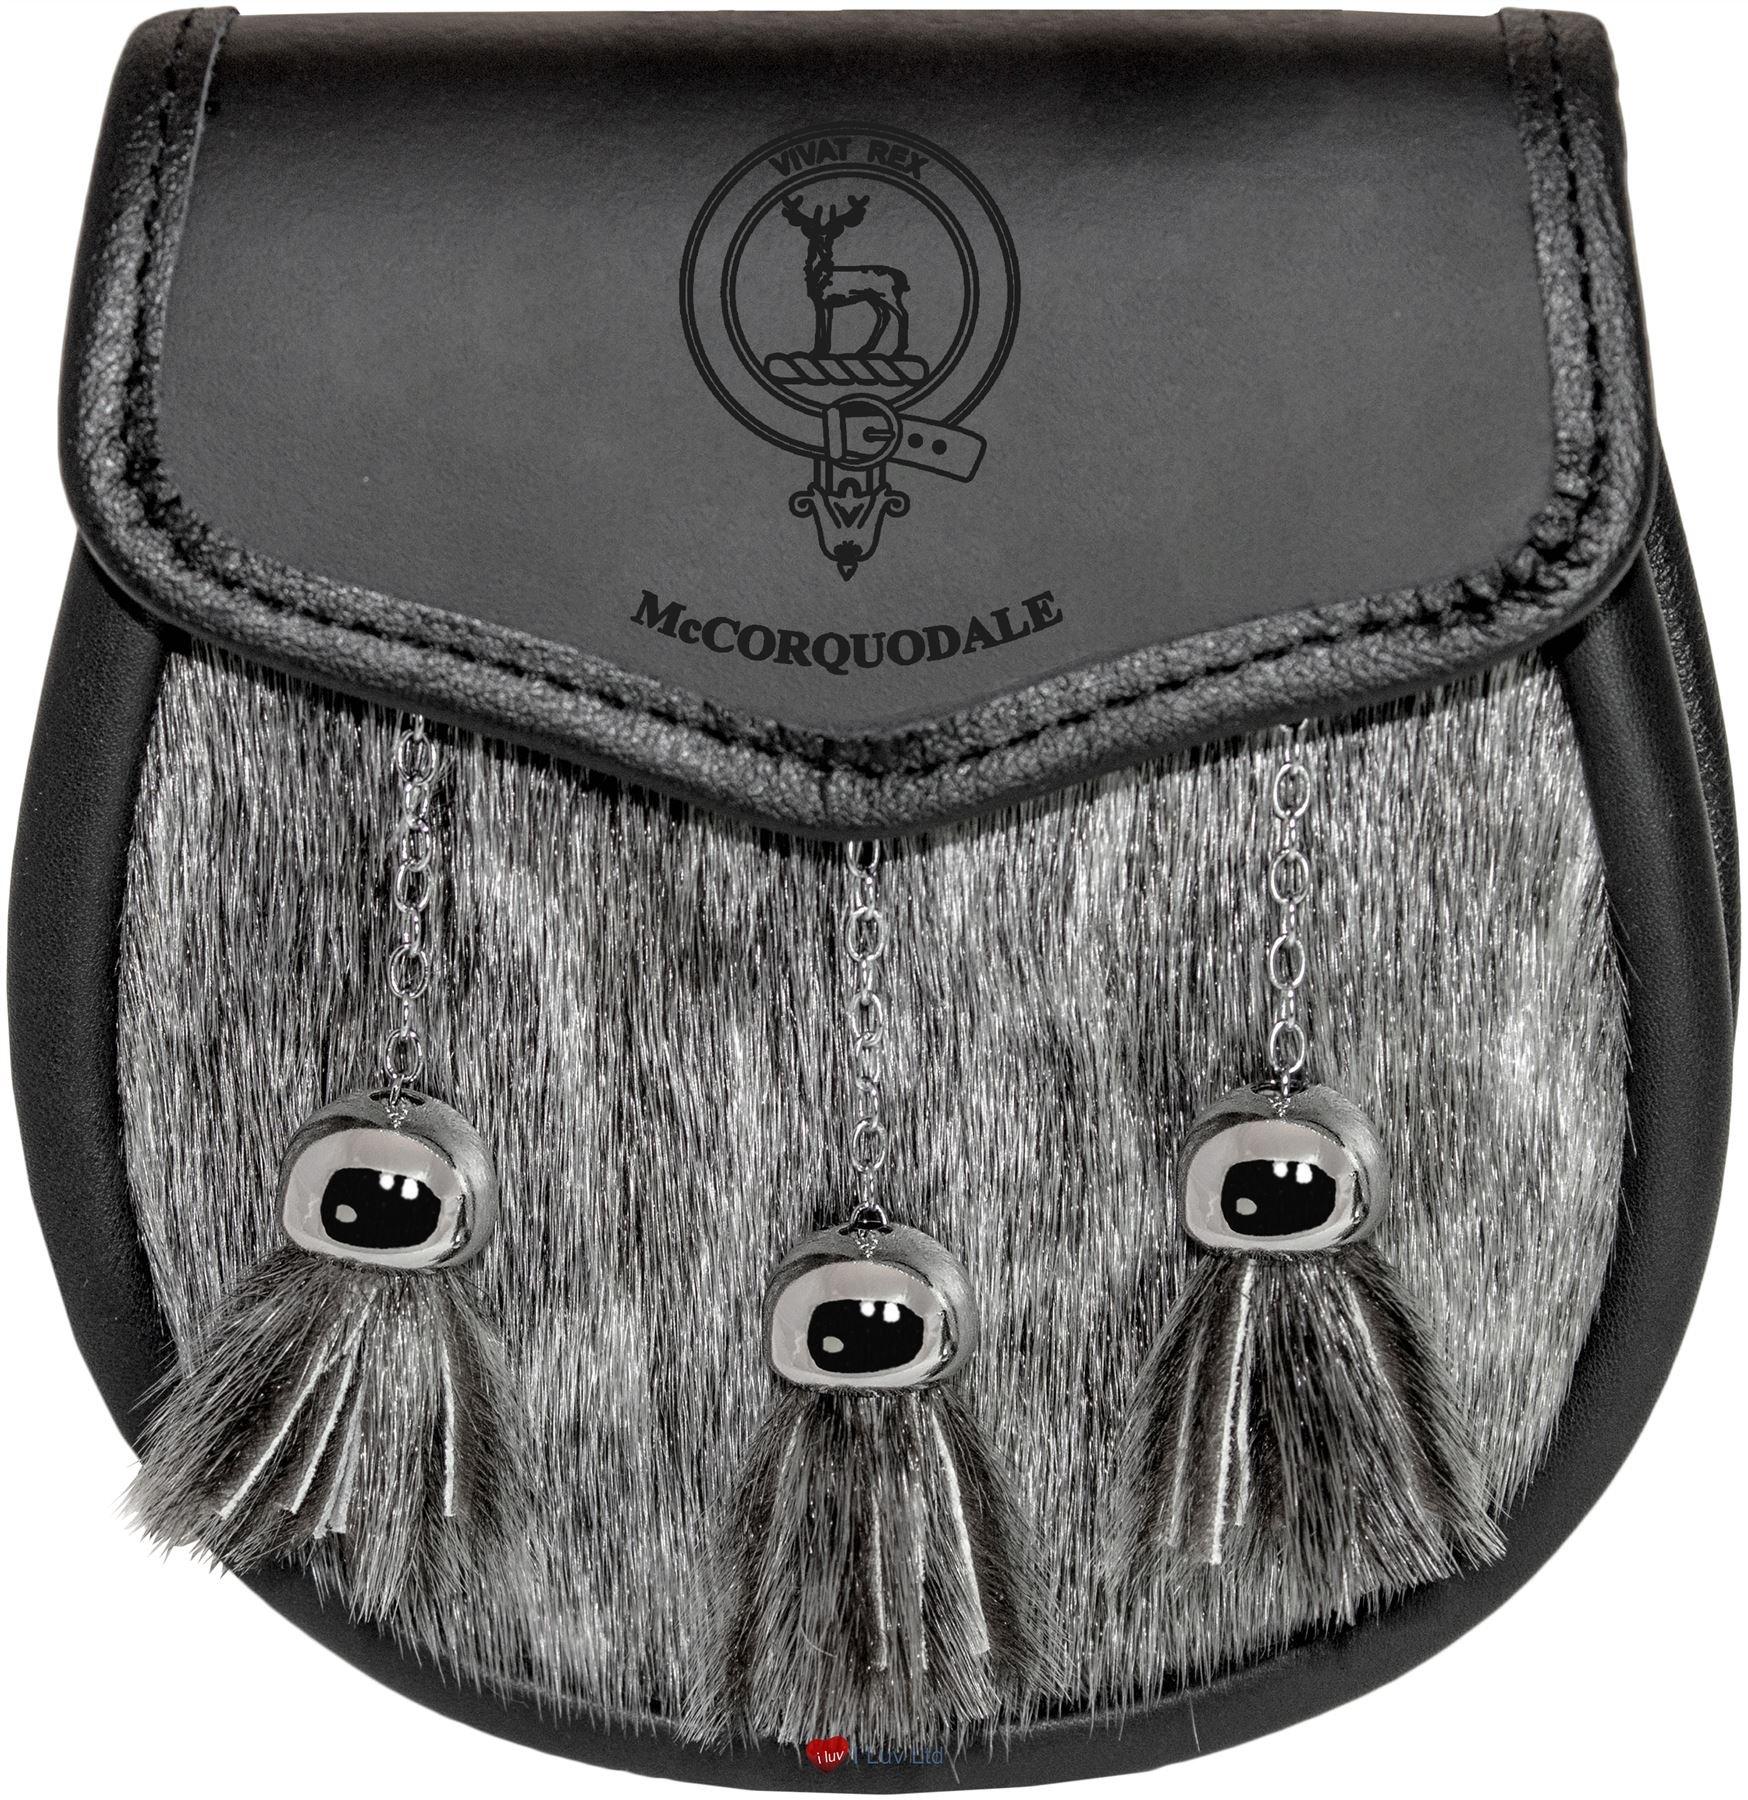 McCorquodale Semi Sporran Fur Plain Leather Flap Scottish Clan Crest